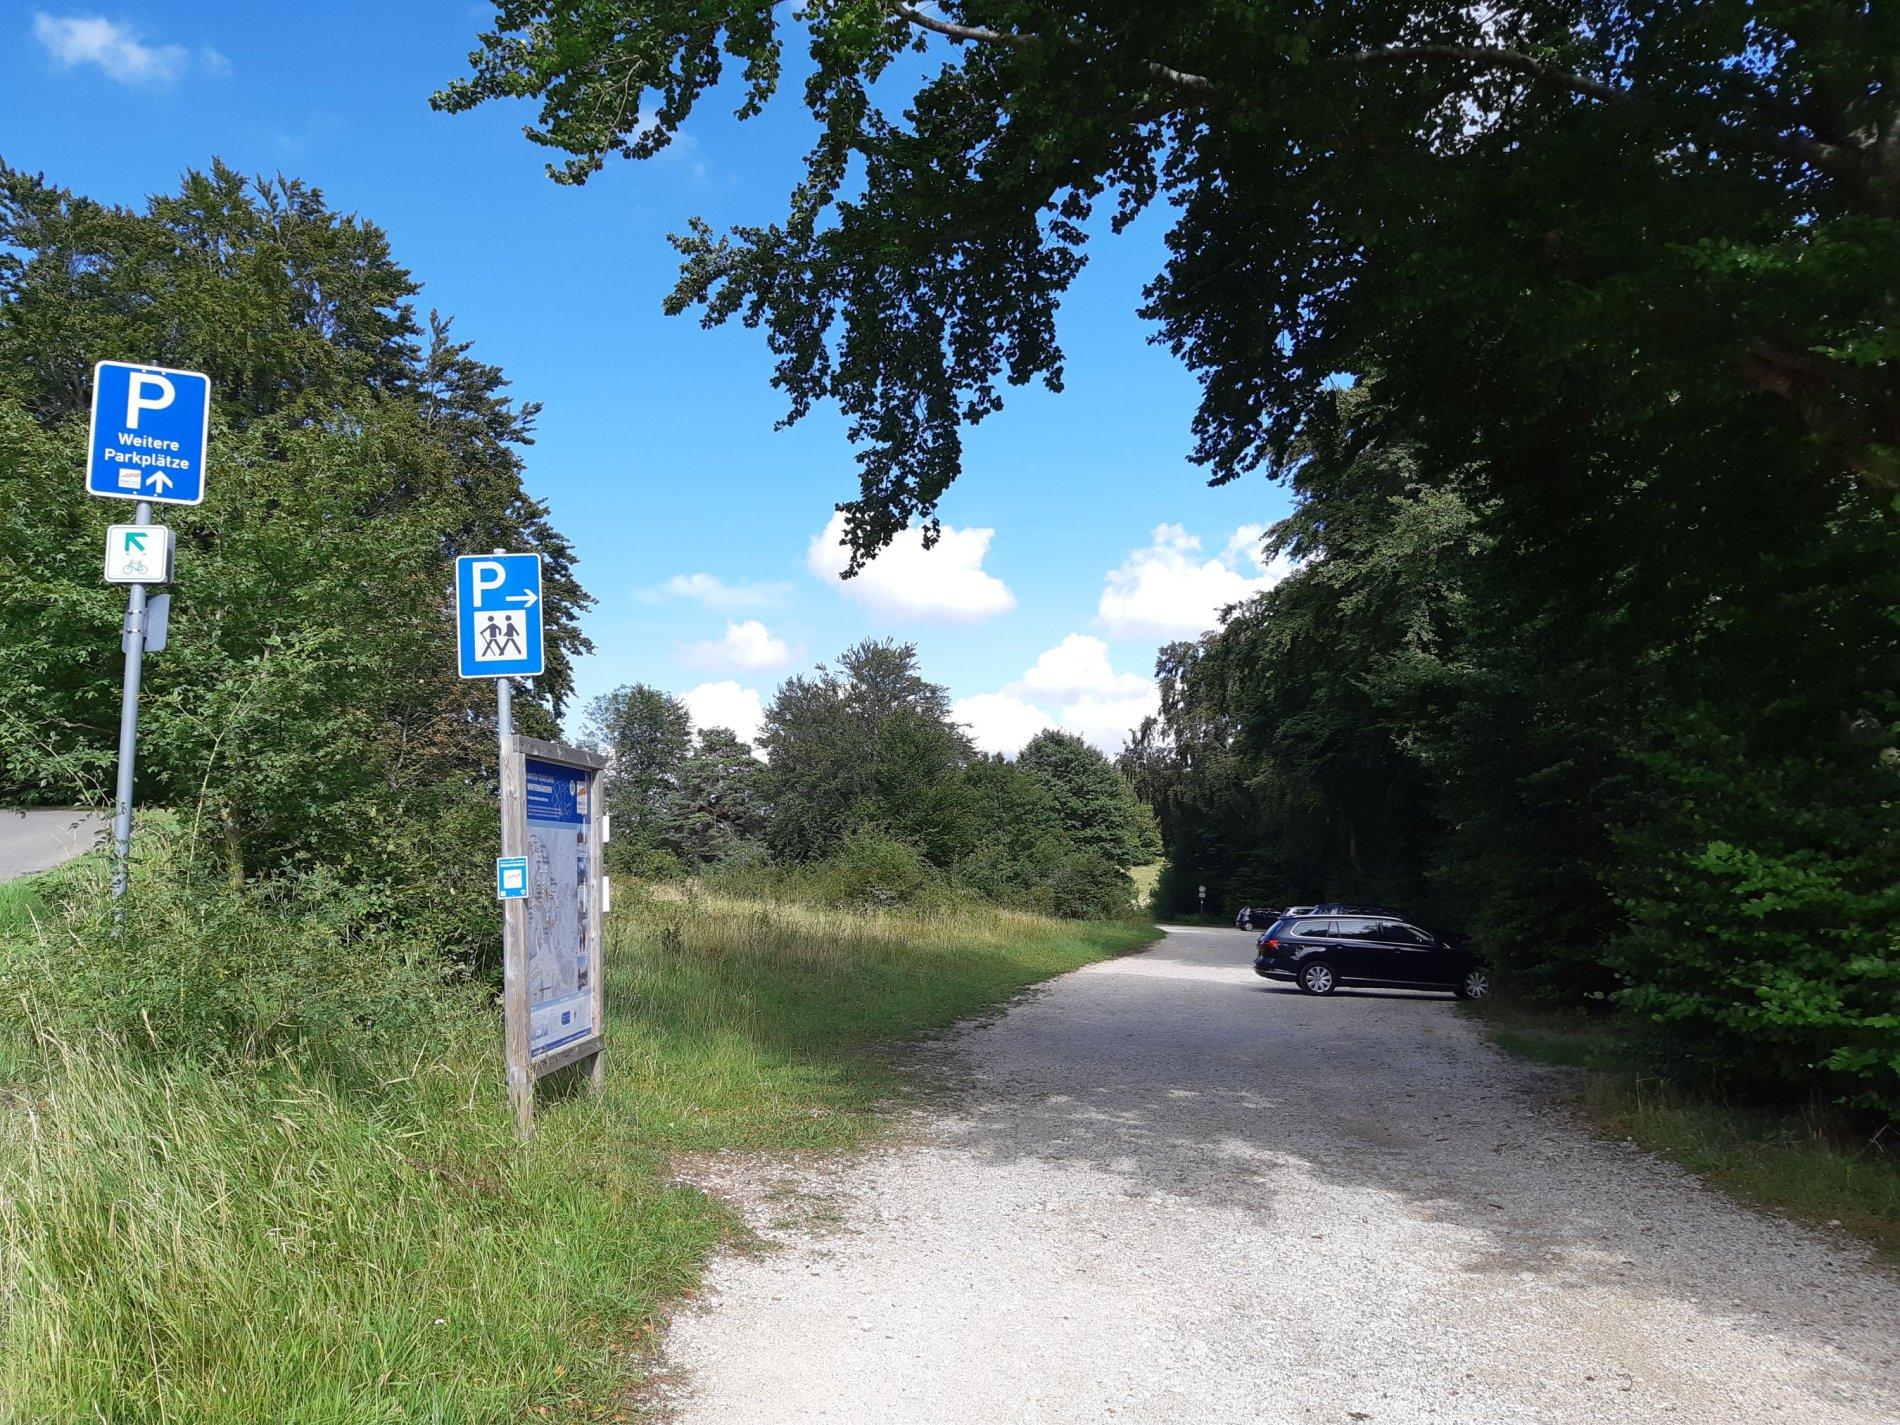 Parkplatz Langer Weg in Albstadt-Onstmettingen